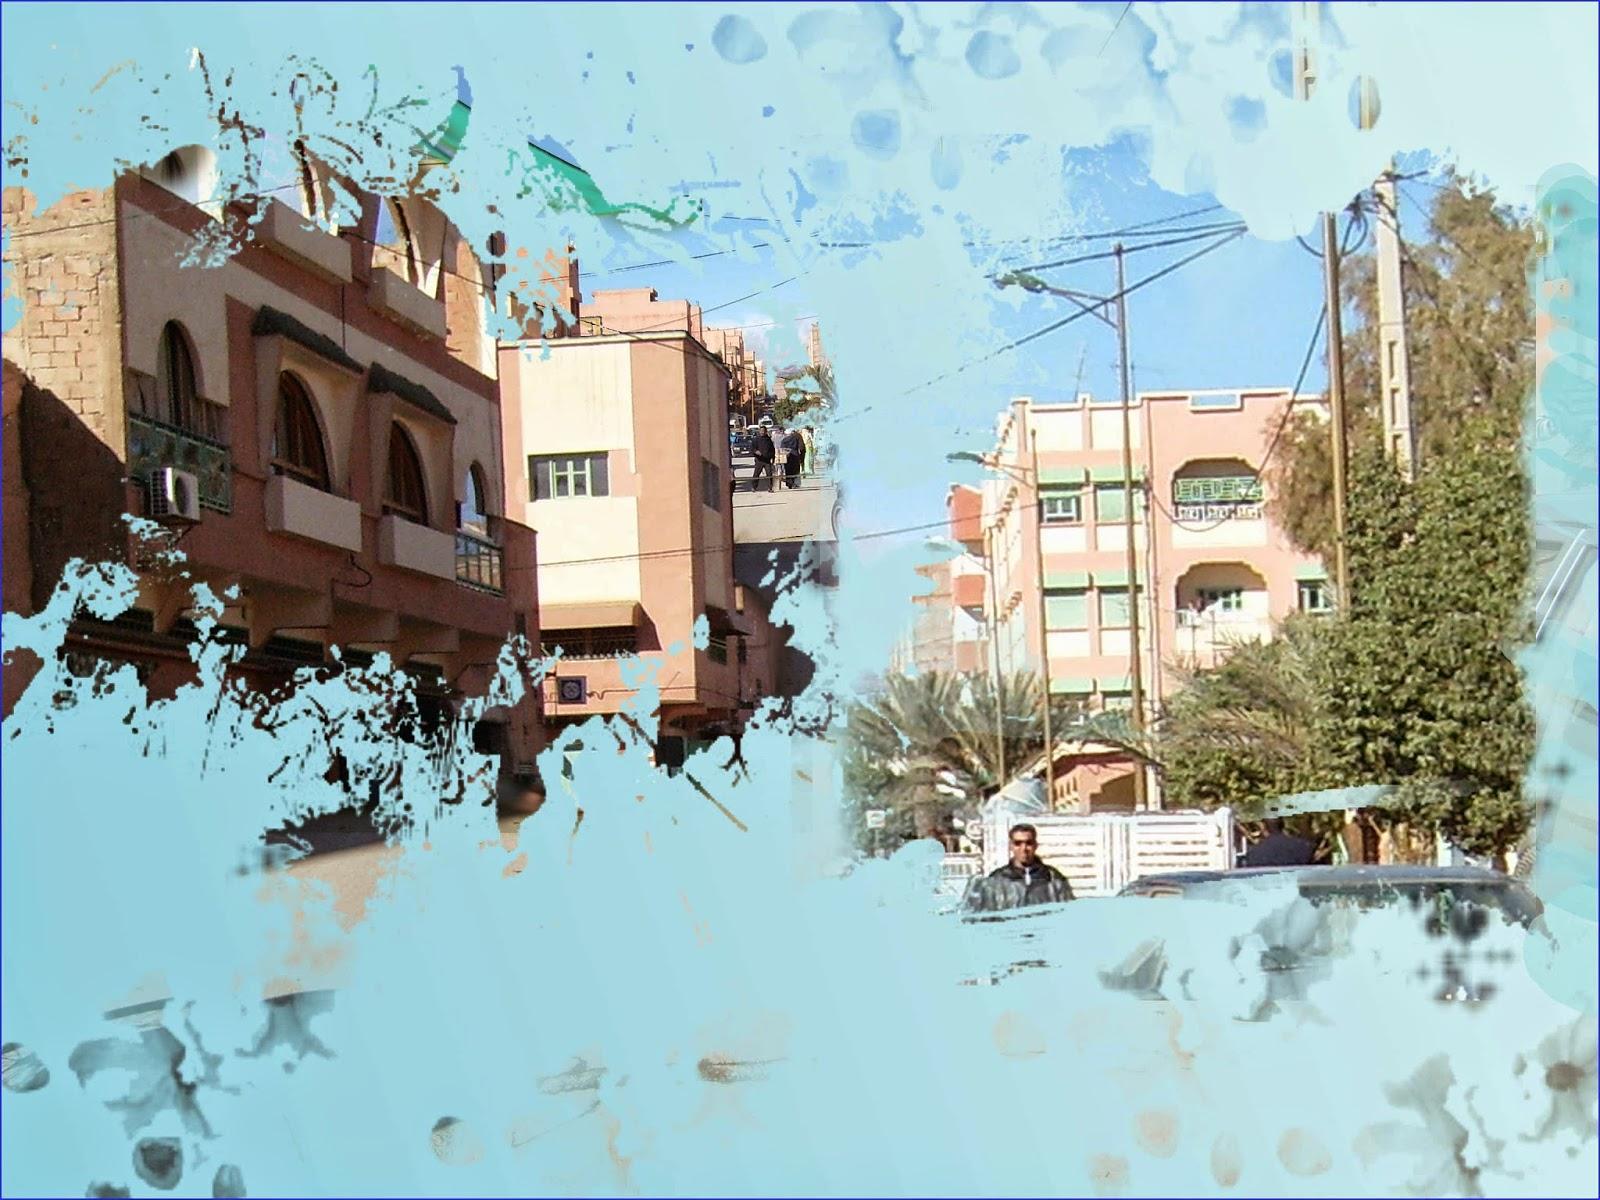 perdue maroc ville